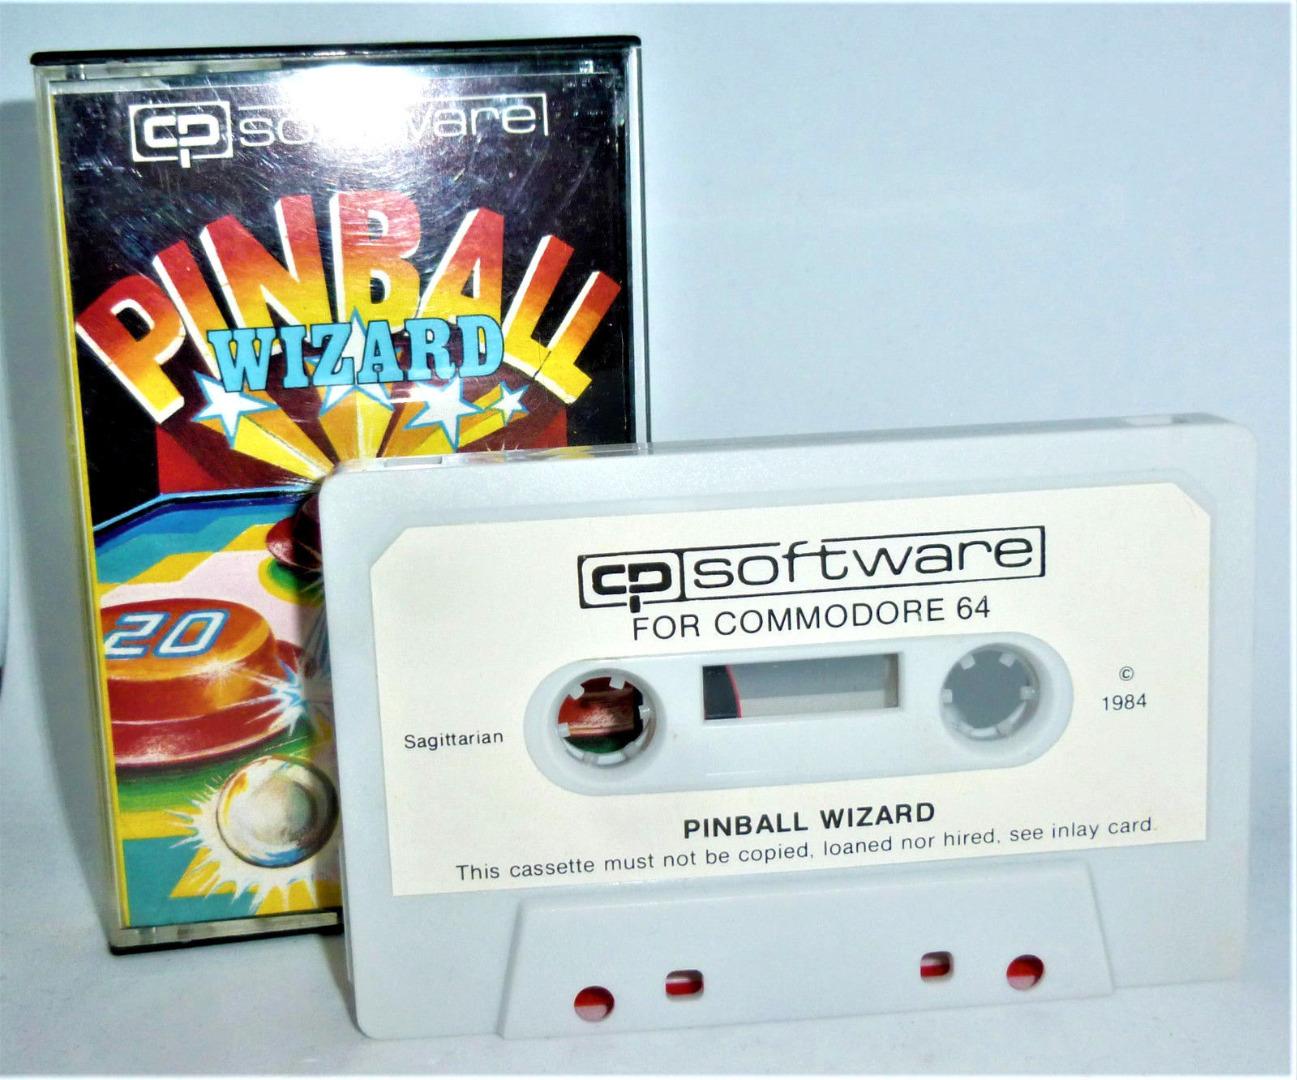 C64 - Pinball Wizard - Kassette - 2